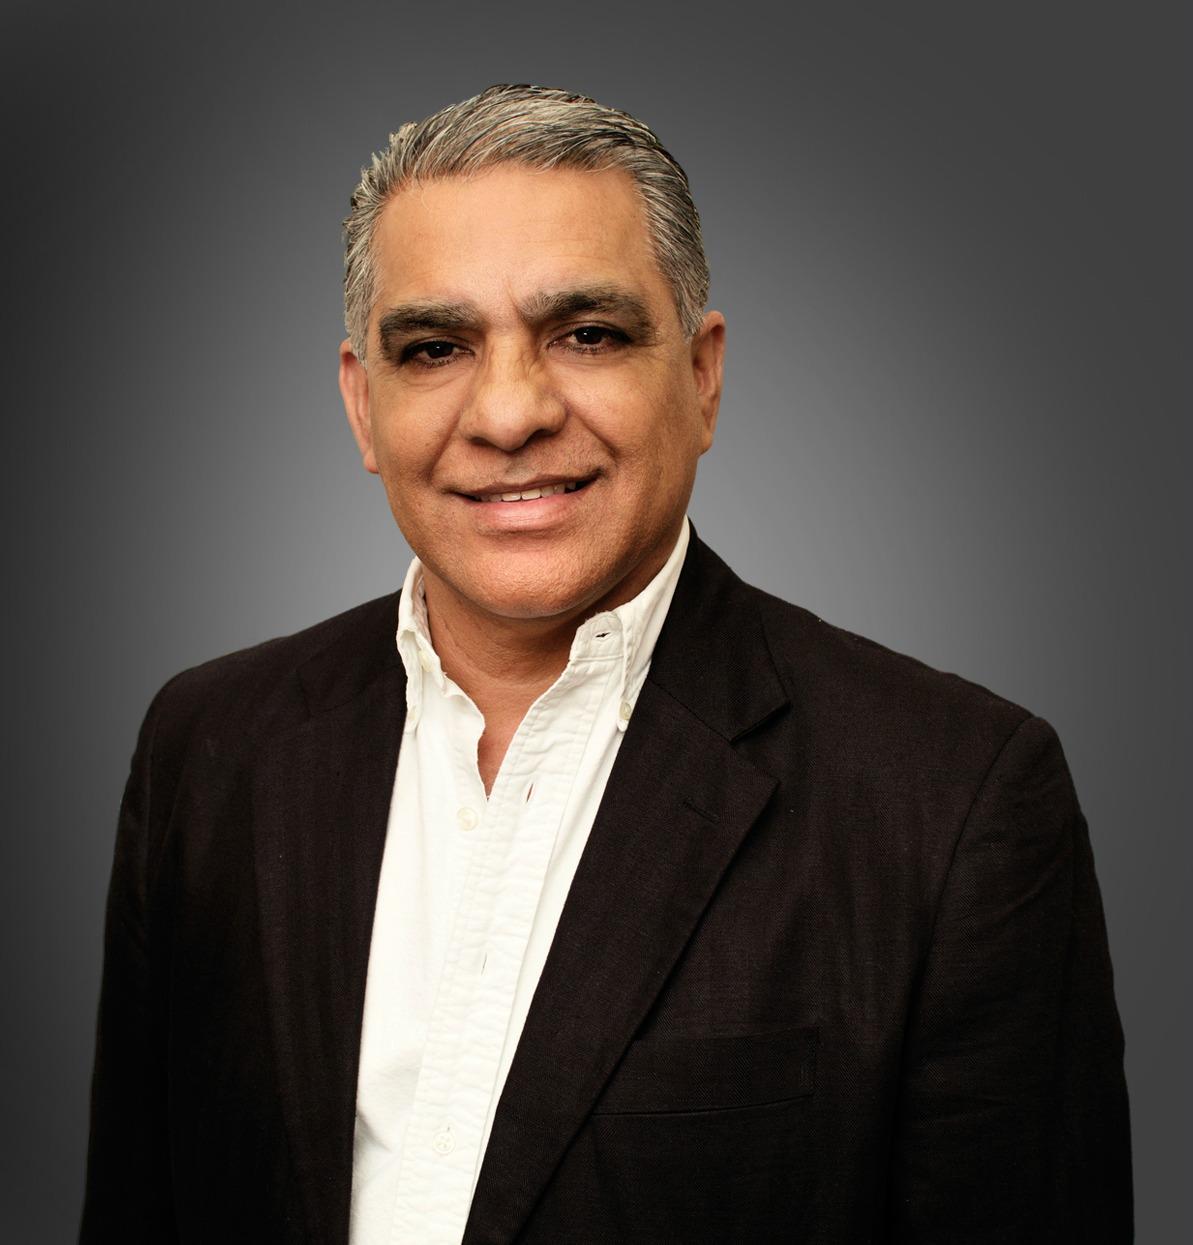 Francisco Javier undefined Rivas